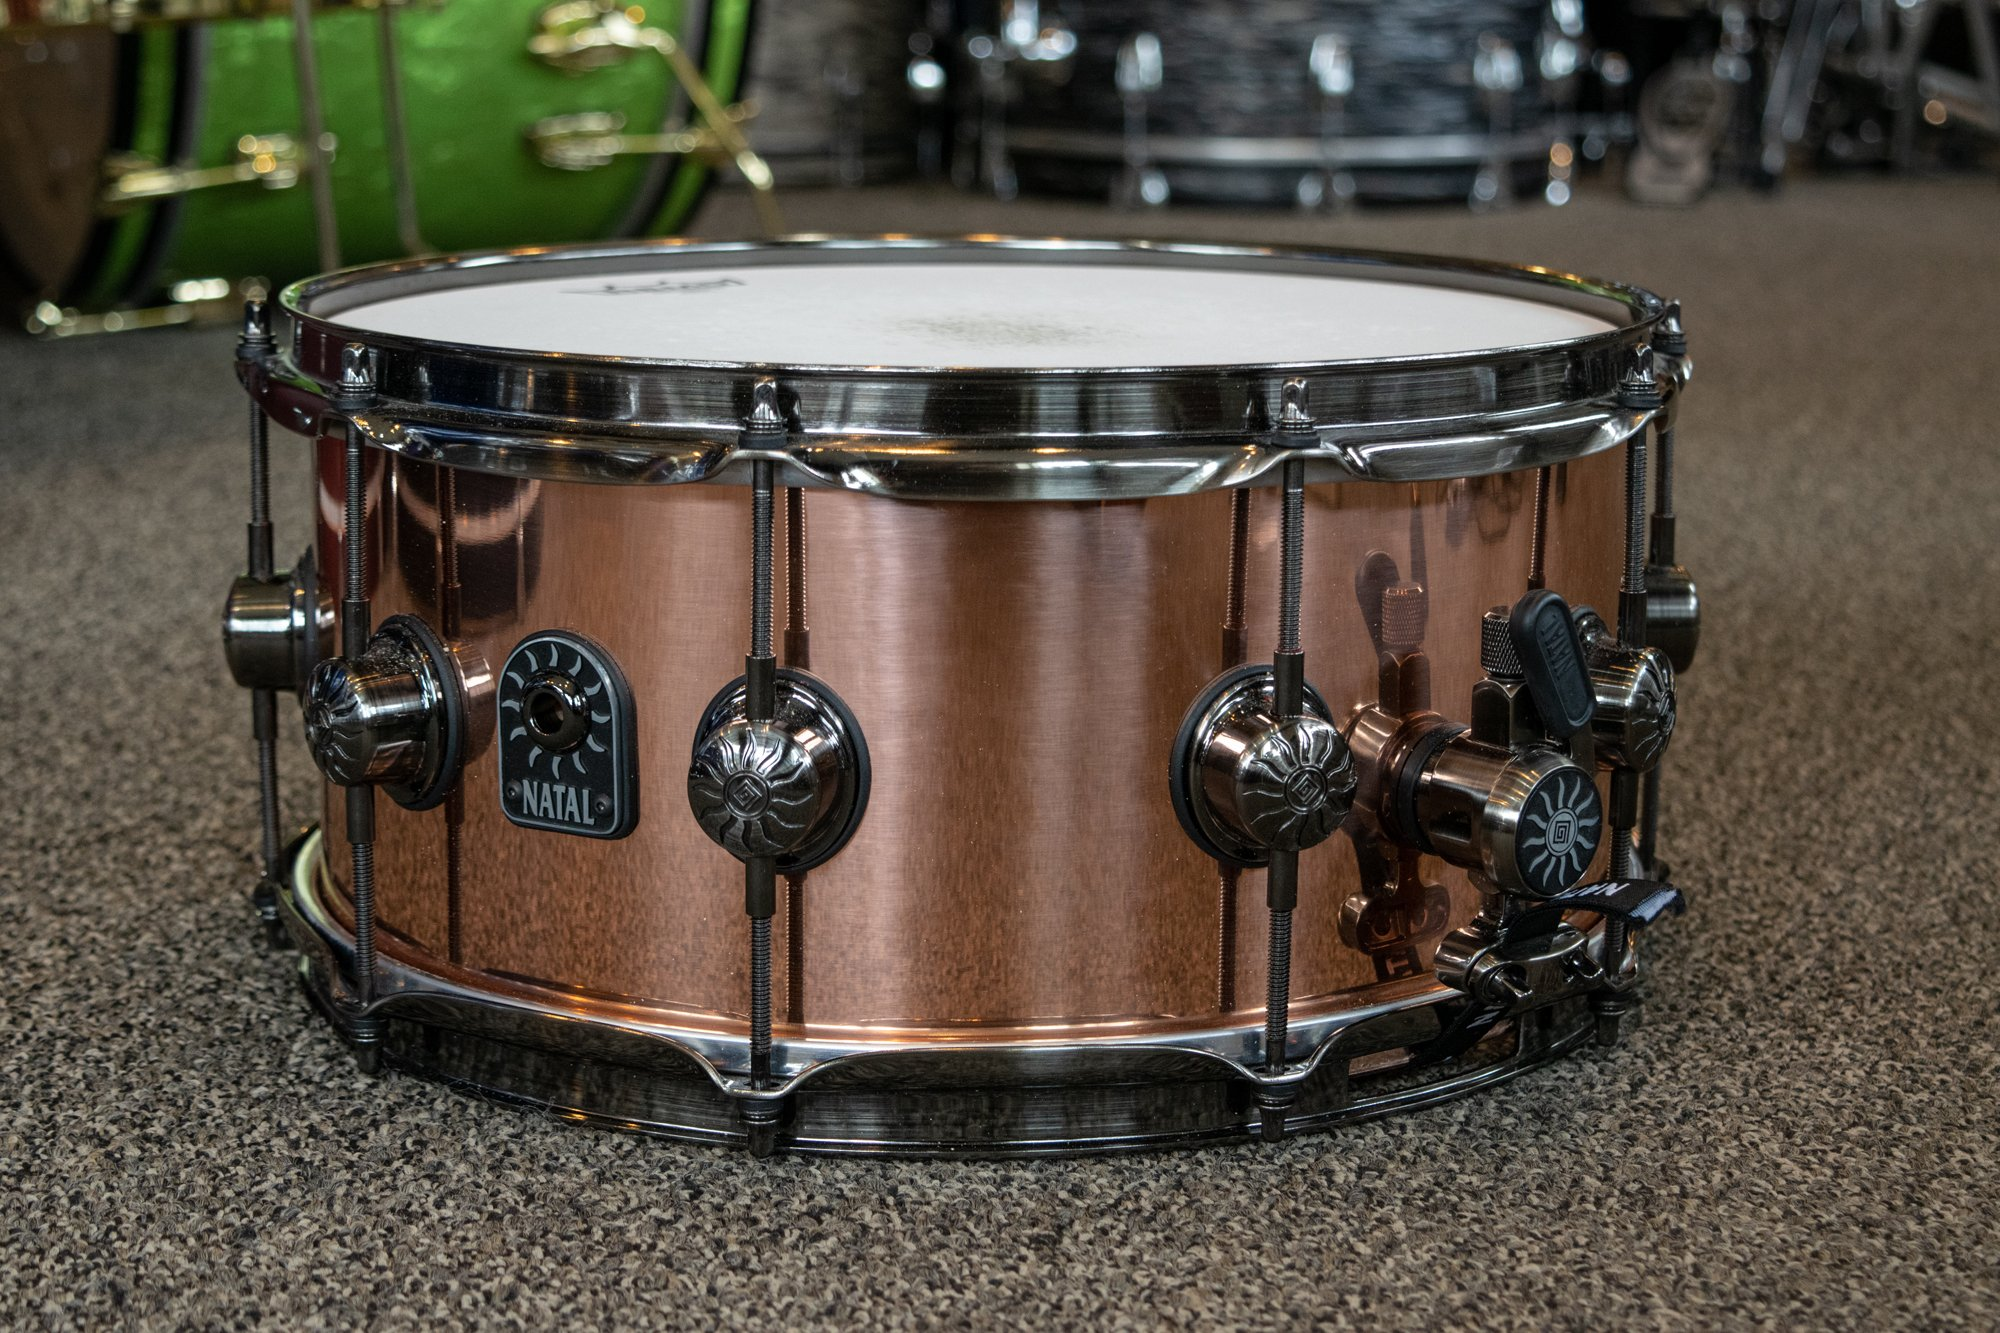 Natal Drums Meta Snare 14 x 6.5 in. Dark Copper (USED)